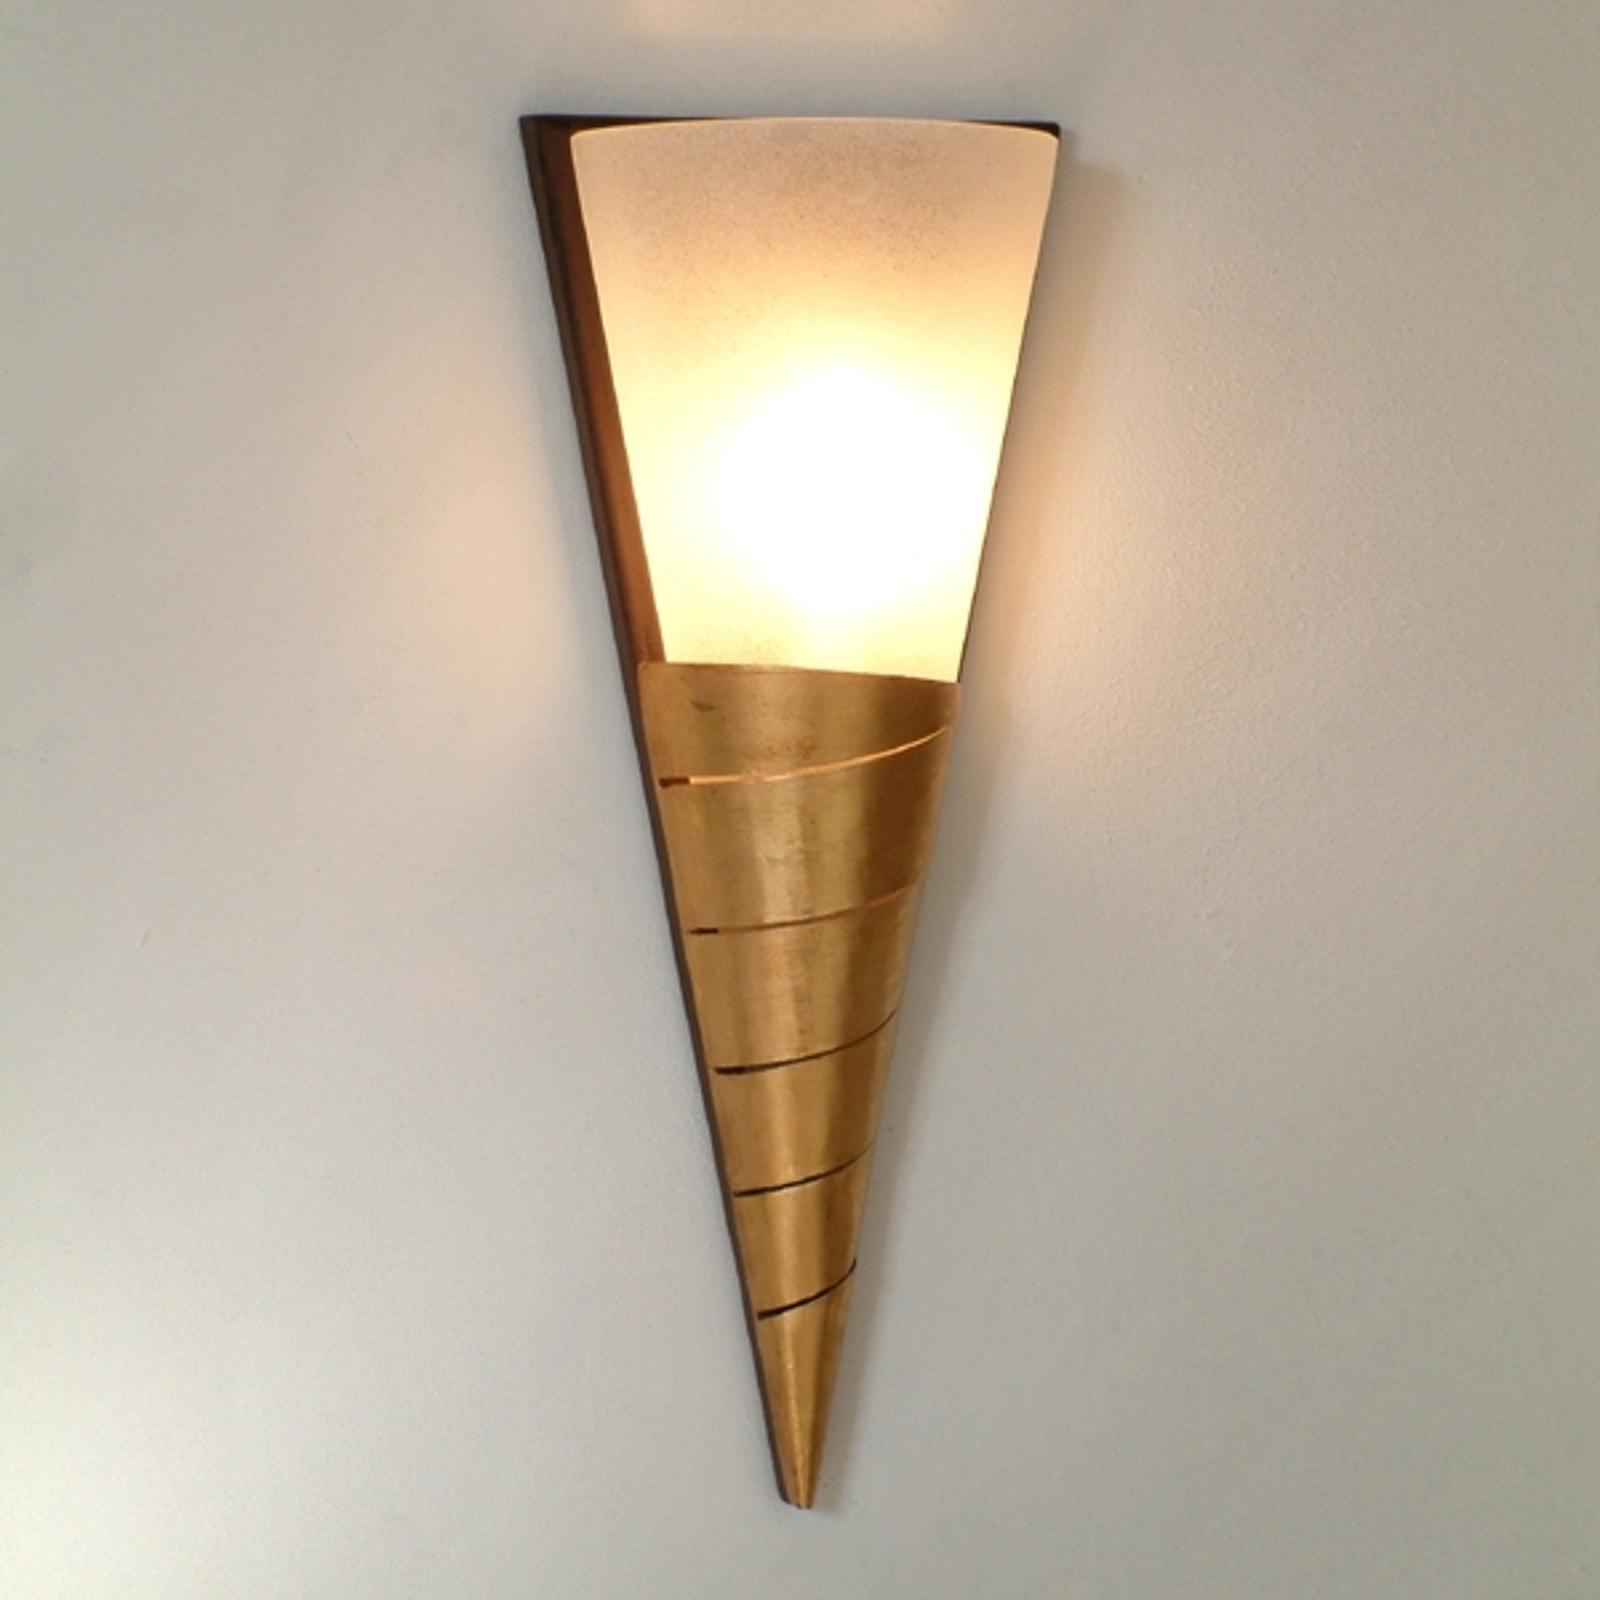 Elegante wandlamp INNOVAZIONE TRE goudkleurig